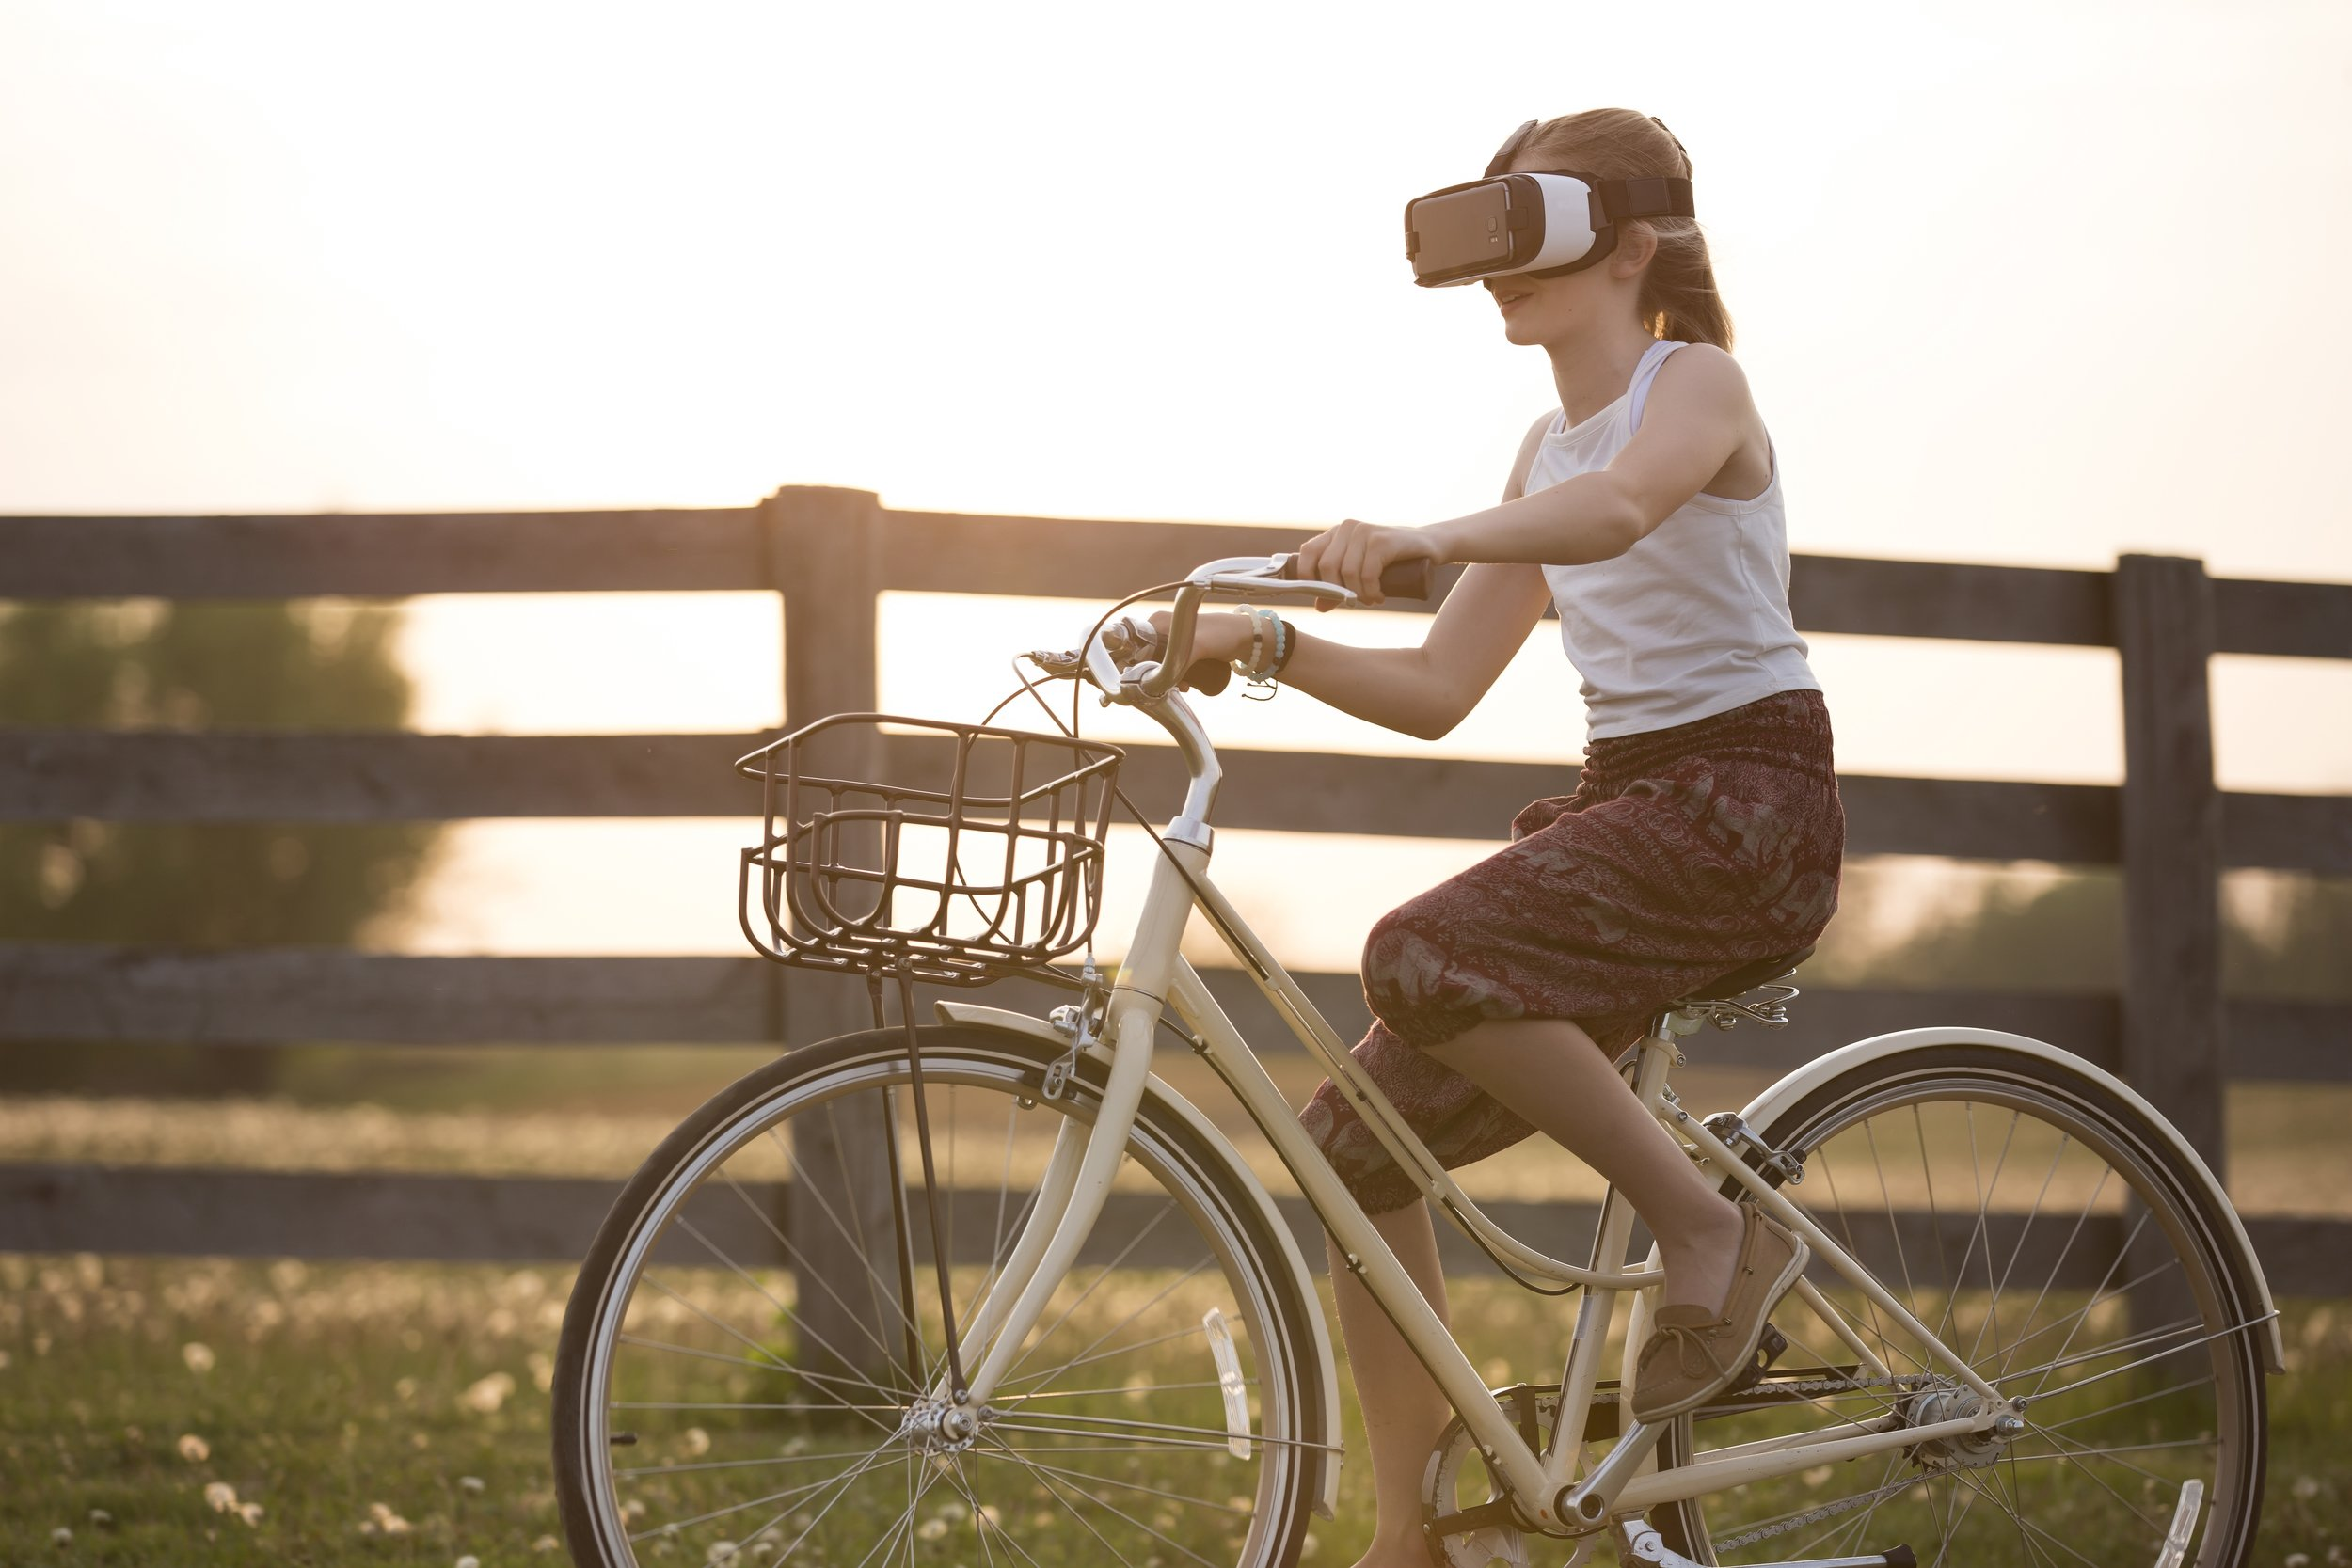 augmented-reality-1853592.jpg